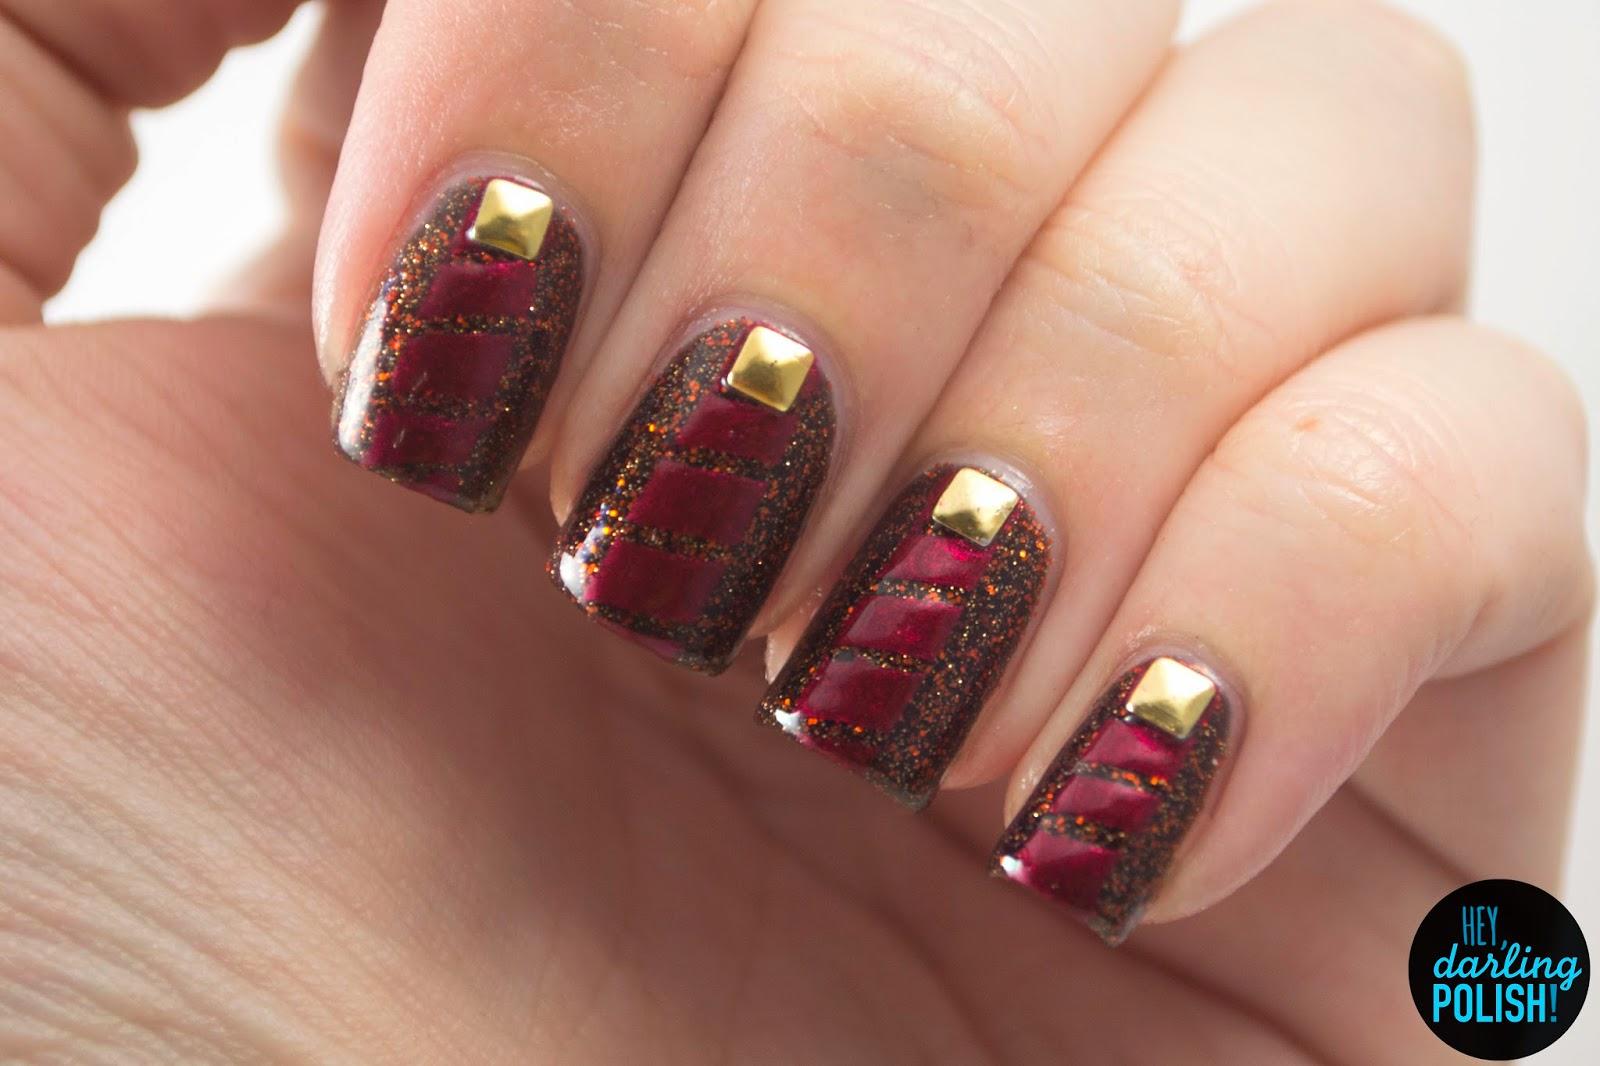 The Never Ending Pile Challenge: Vampy • Polish Those Nails